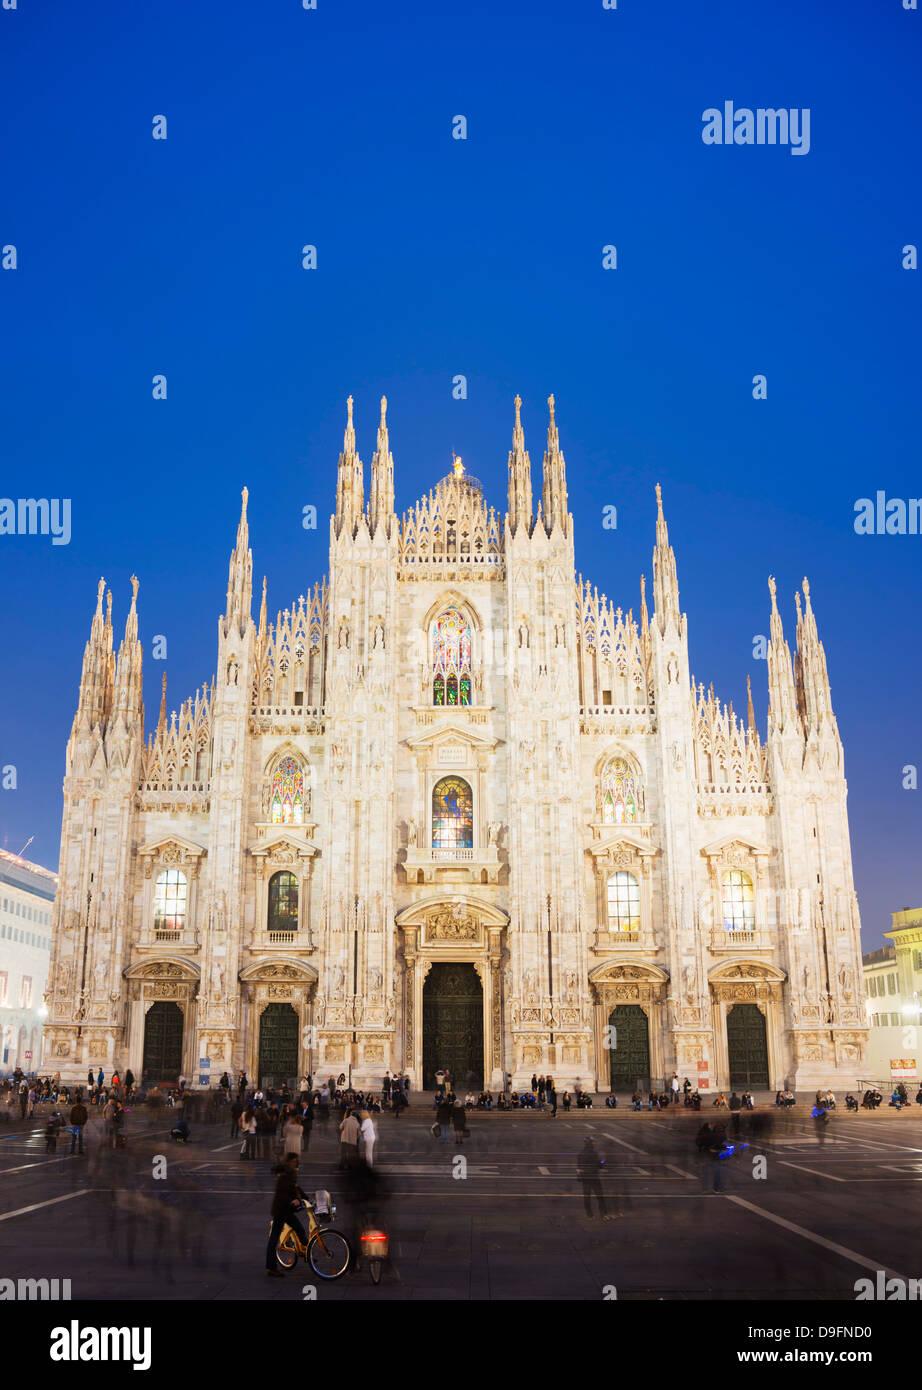 Duomo (Milan Cathedral), Milan, Lombardy, Italy - Stock Image